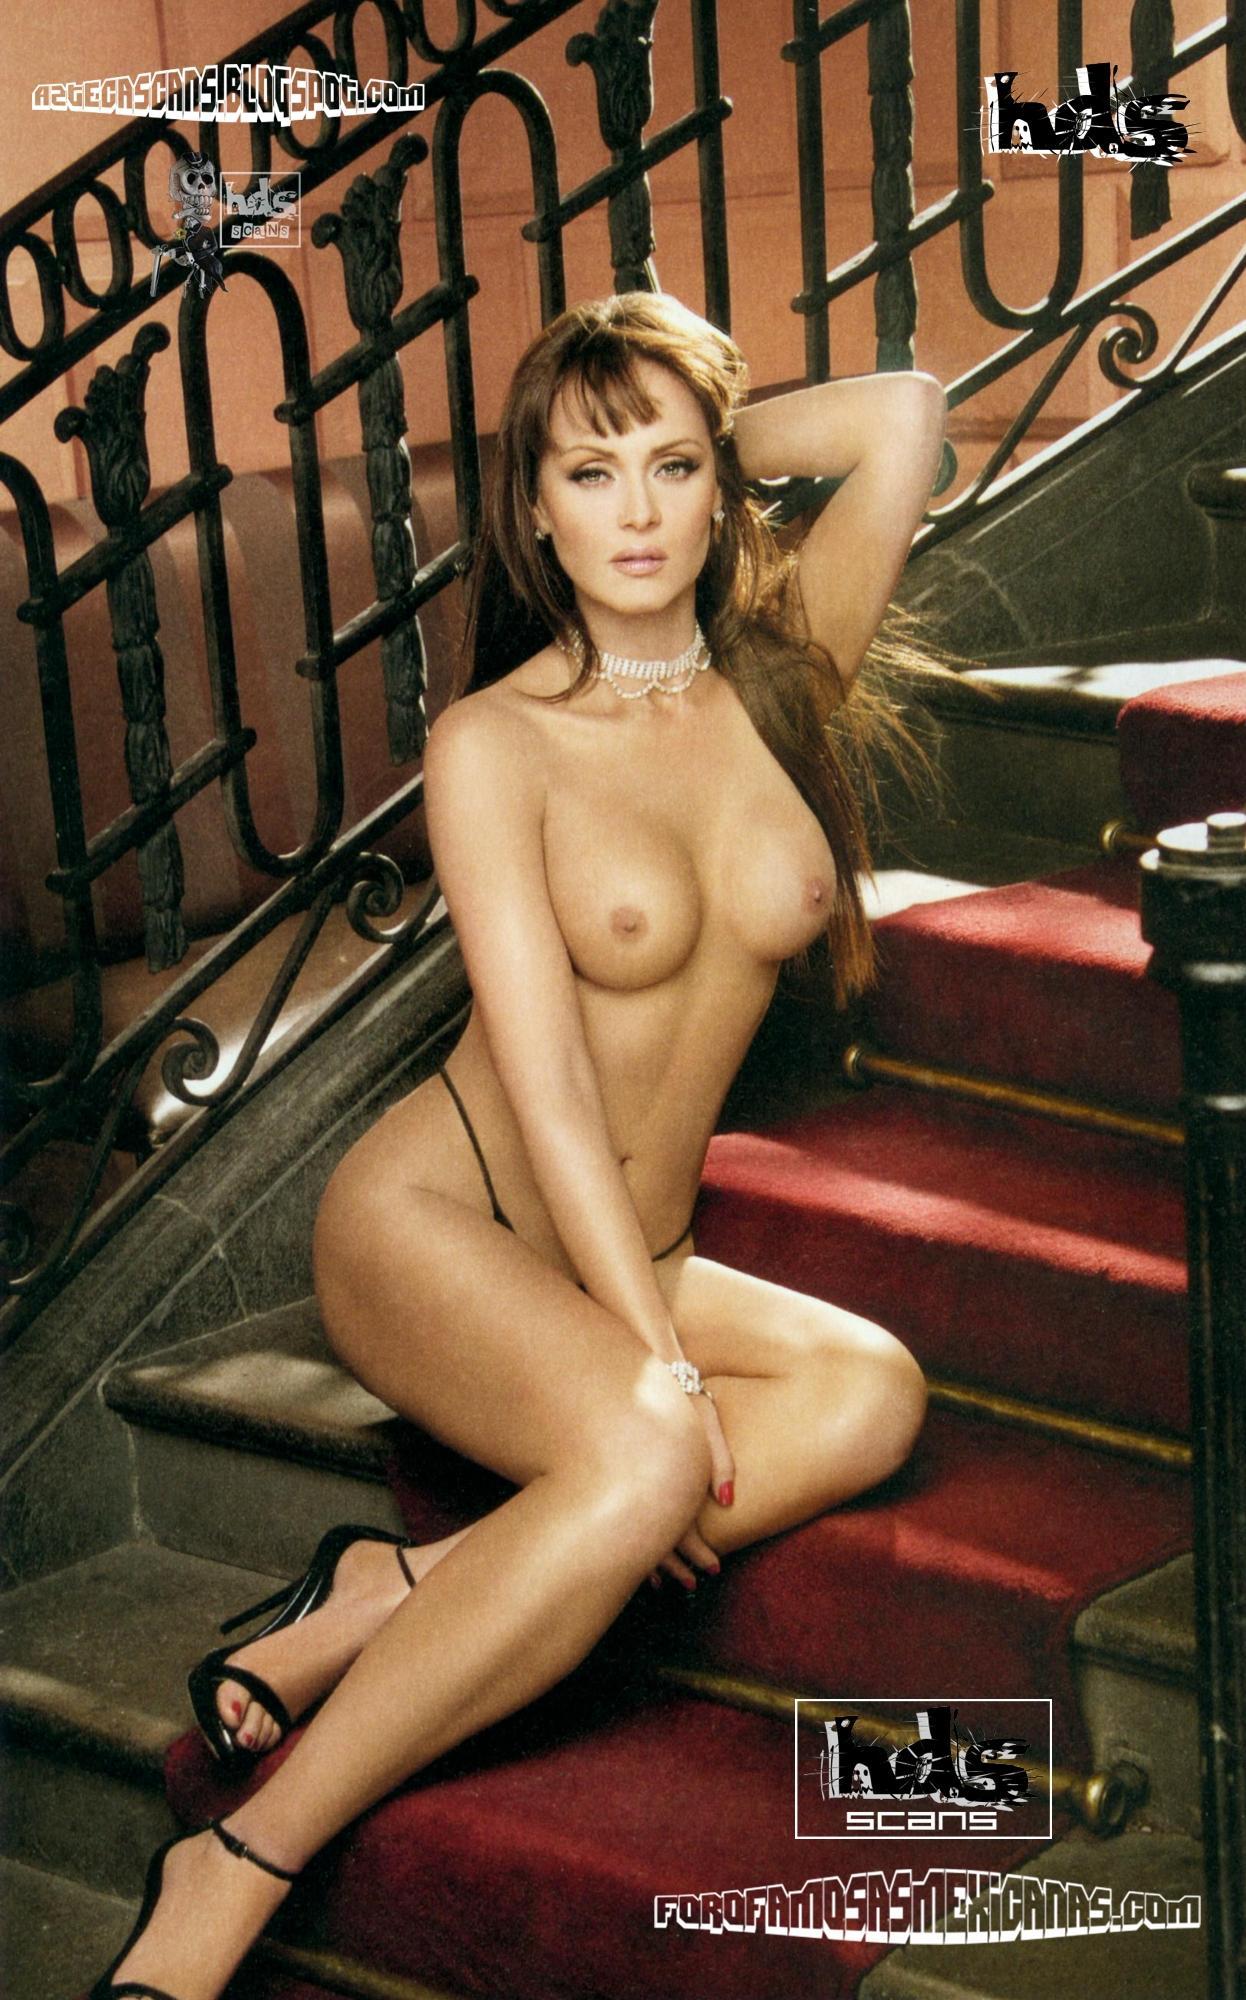 Megan masacre hot desnuda